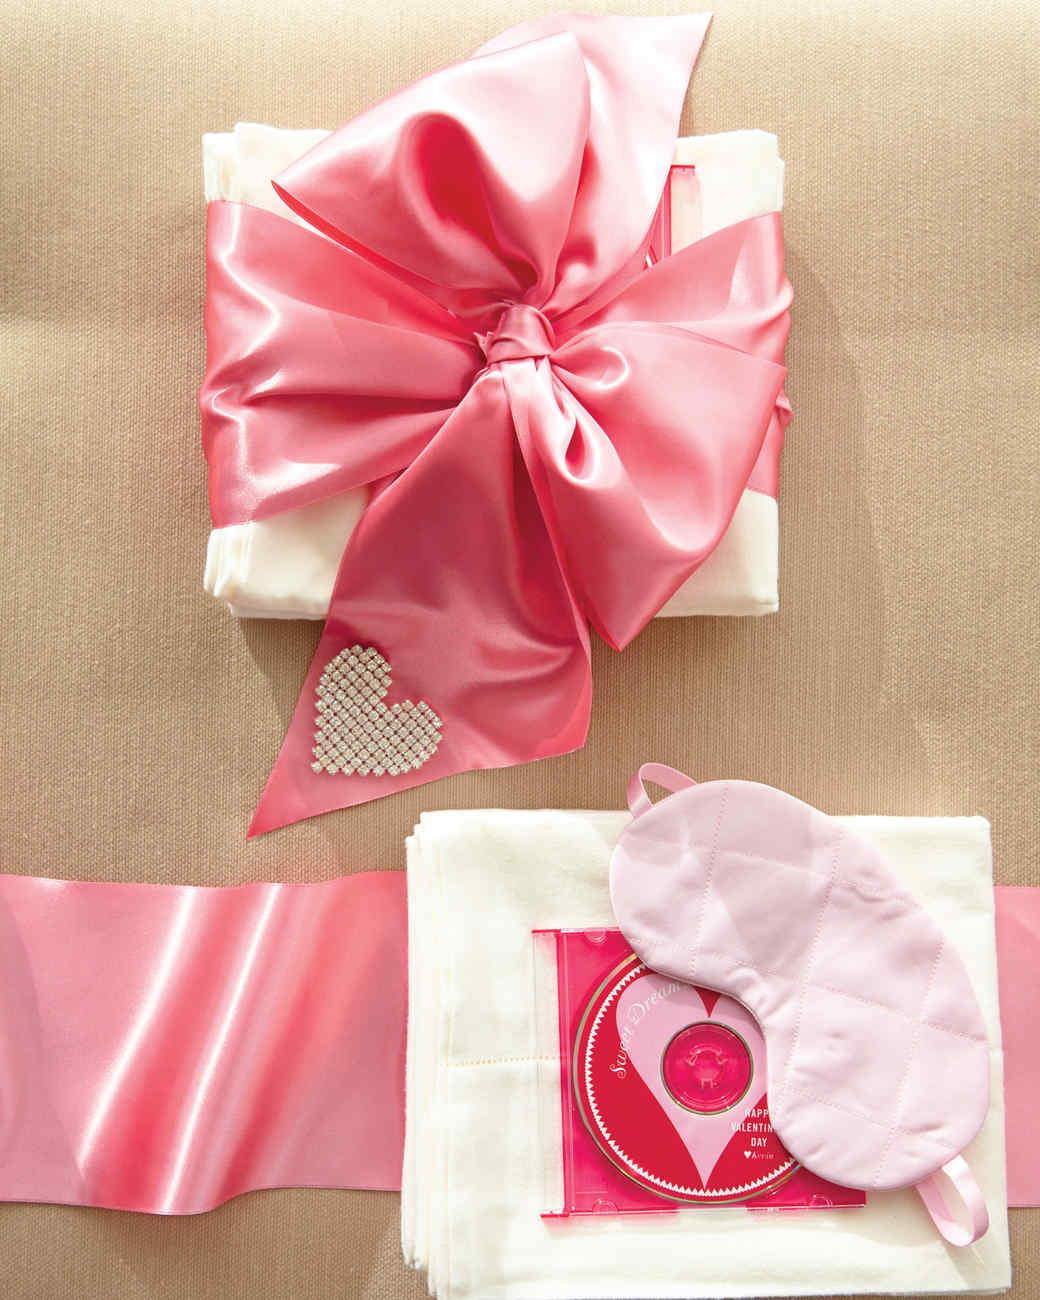 mmld106784_0211_valentine_1108.jpg